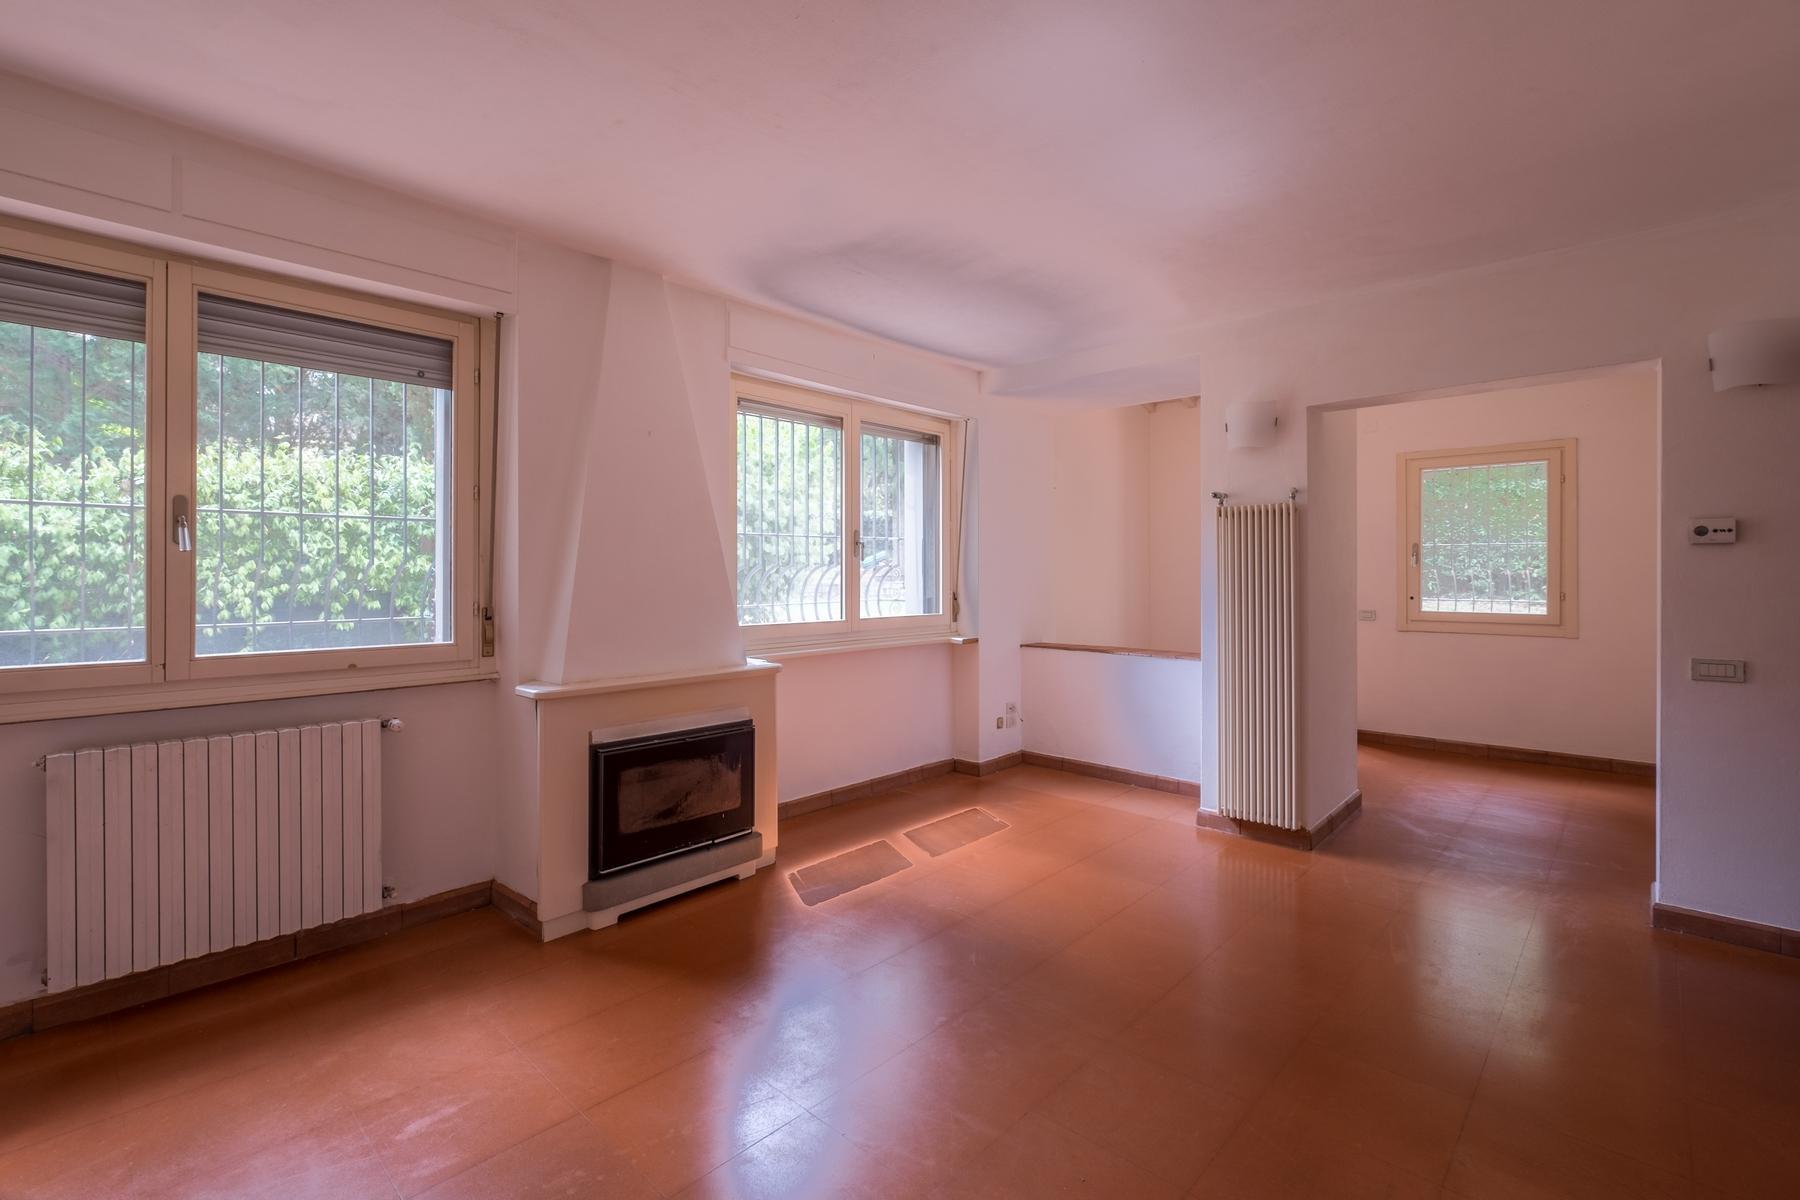 Lovely apartment in exclusive Poggio Imperiale area - 7